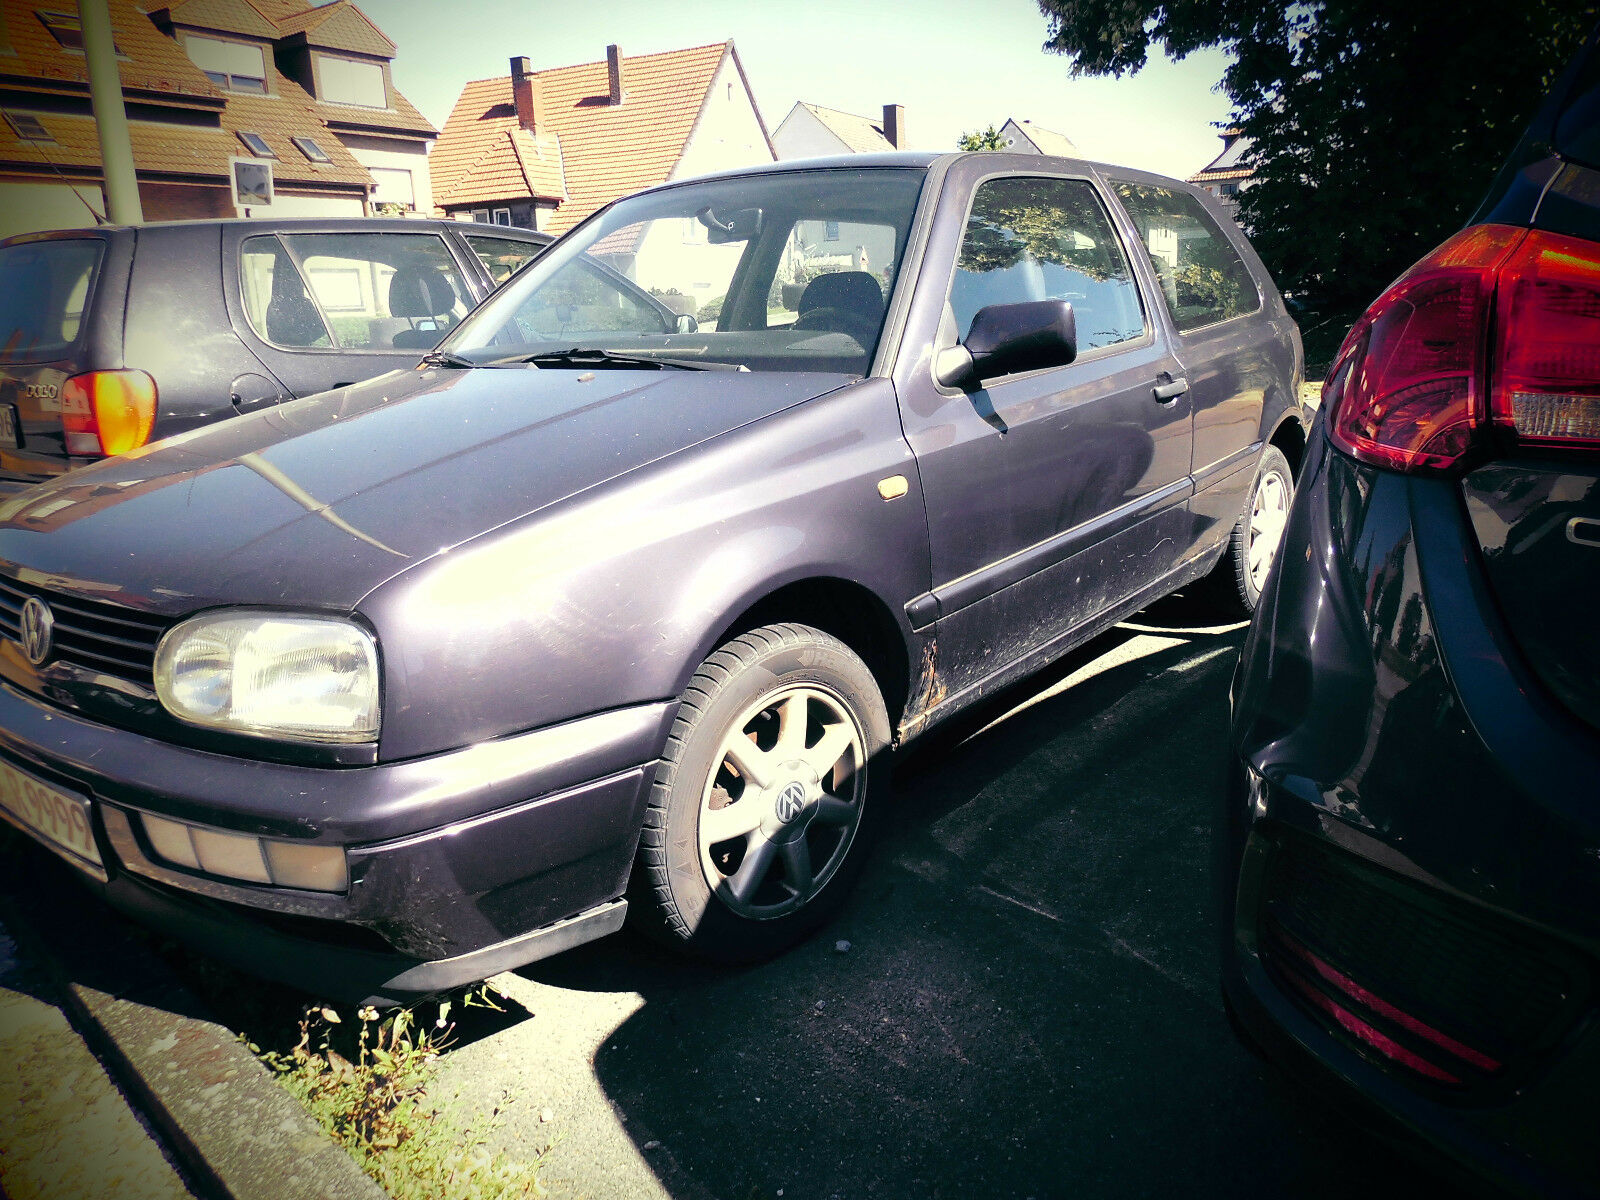 VW Golf III Baujahr 1997